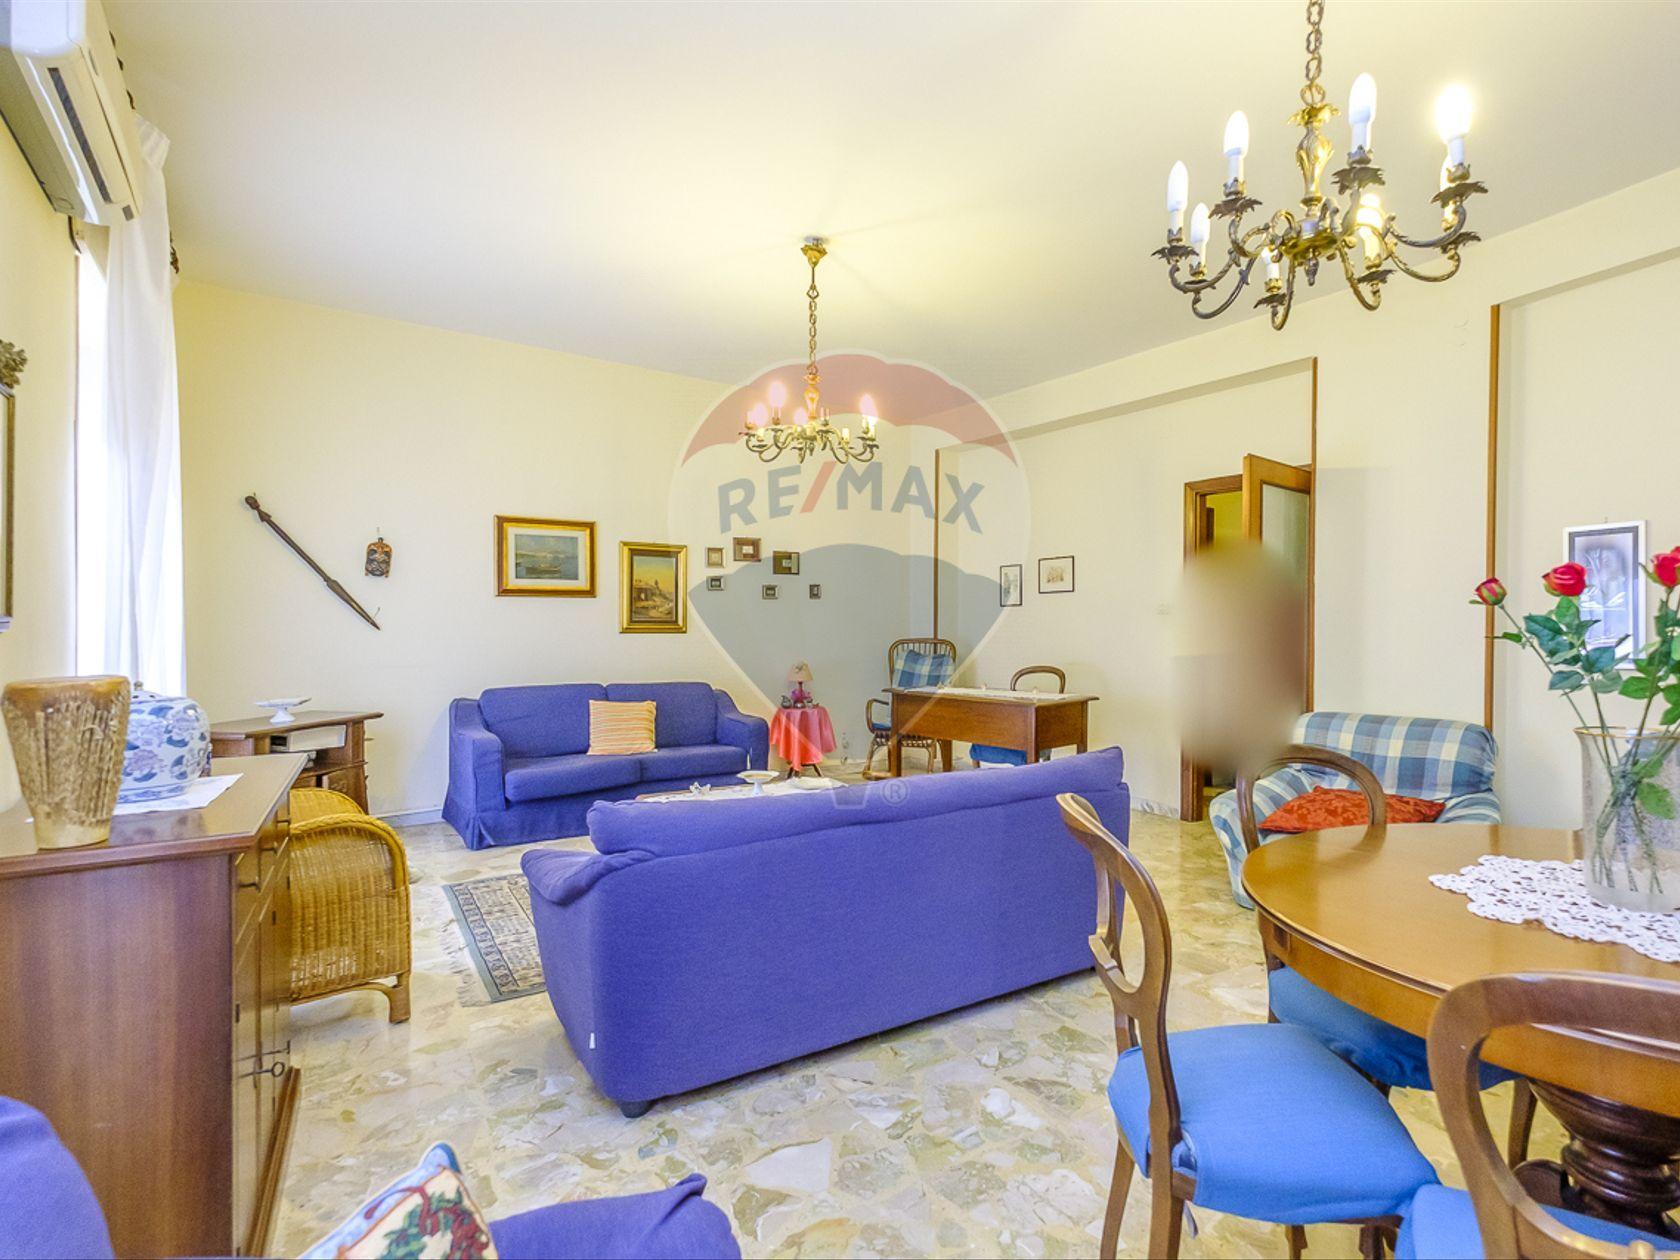 Appartamento Siracusa- Scala Greca S. Panagia Teracati Zecchino, Siracusa, SR Vendita - Foto 2